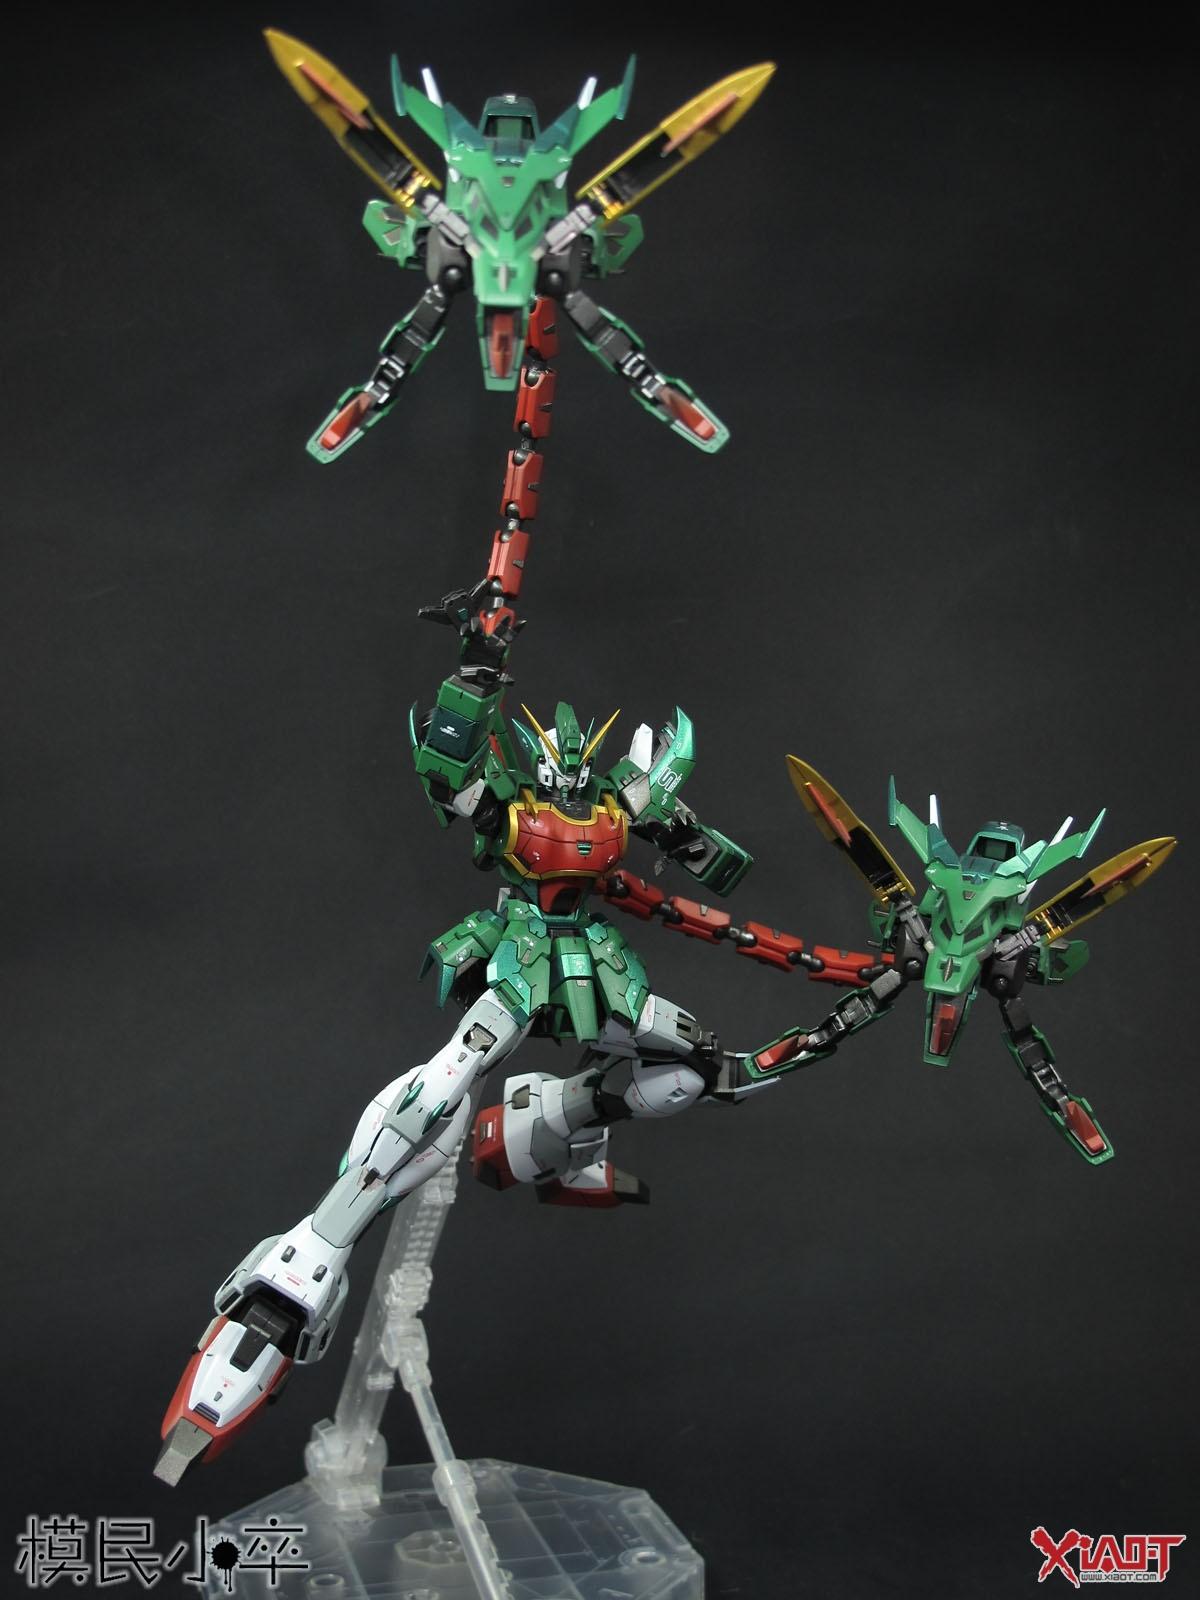 Custom Build: MG 1/100 Gundam Nataku - Gundam Kits ...